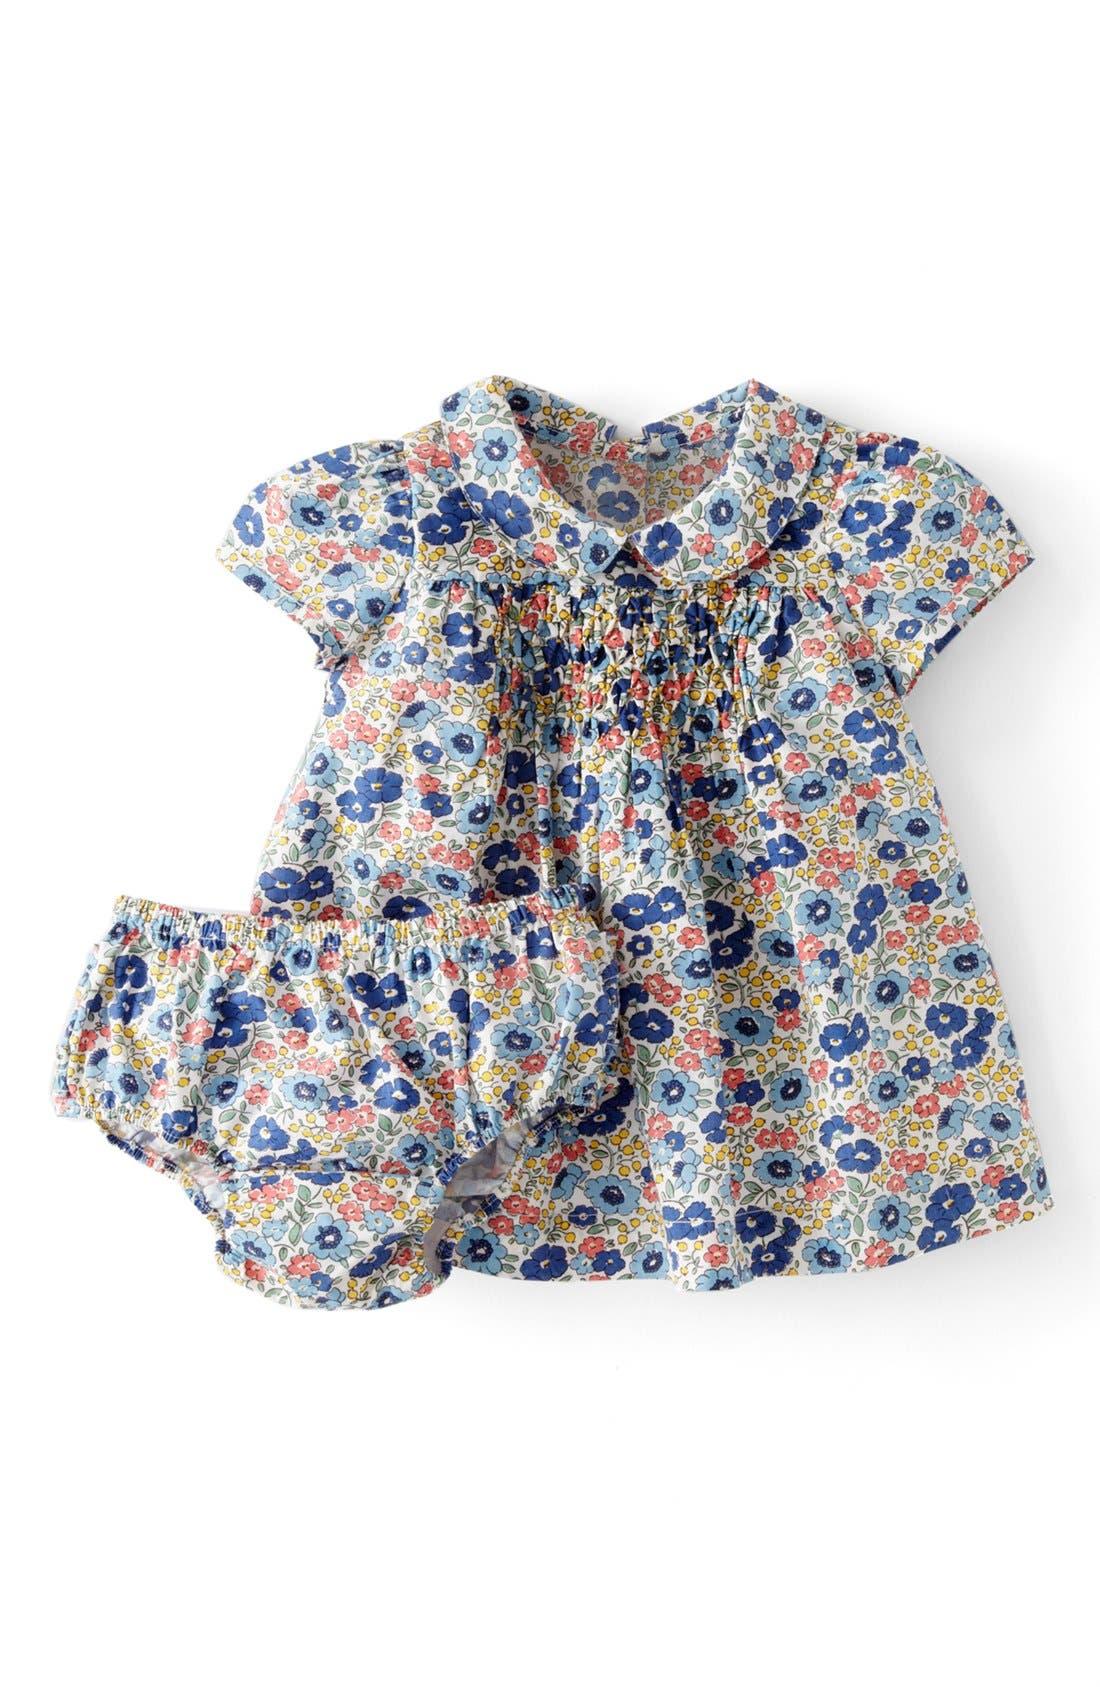 Main Image - Mini Boden 'Pretty Printed' Tea Dress (Baby Girls)